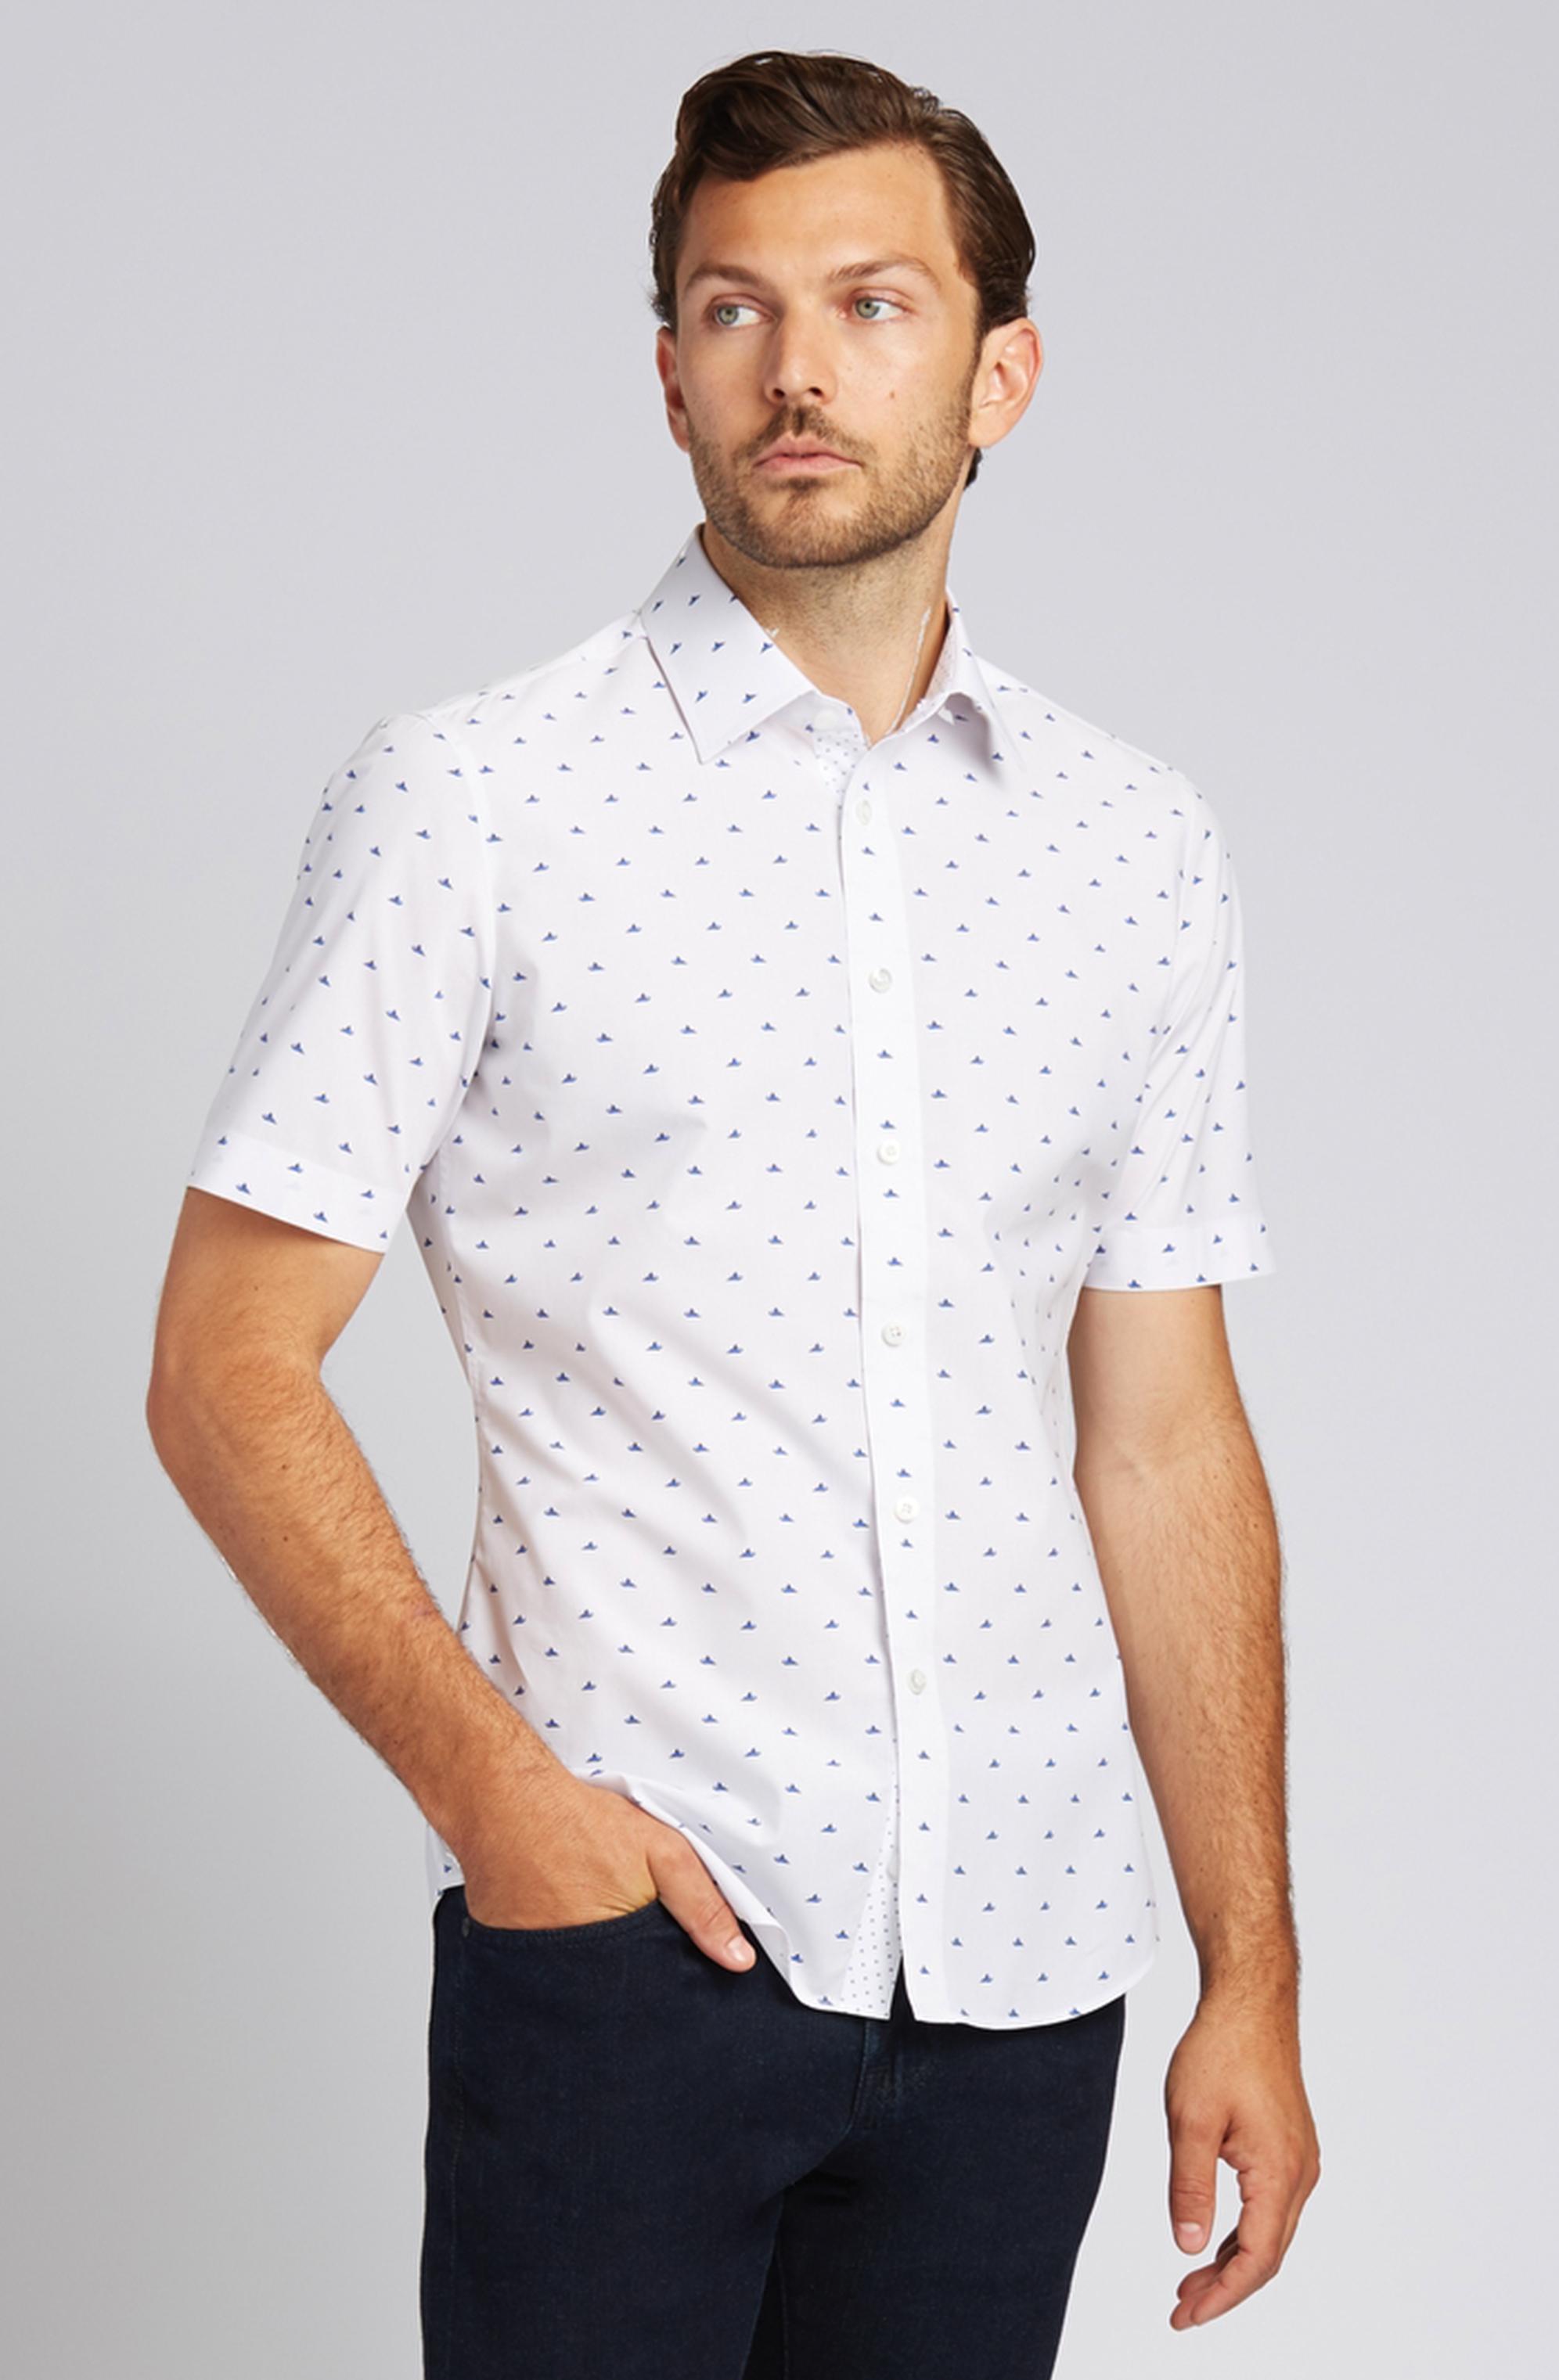 Jet-Ski Short-Sleeve Button-Front Shirt